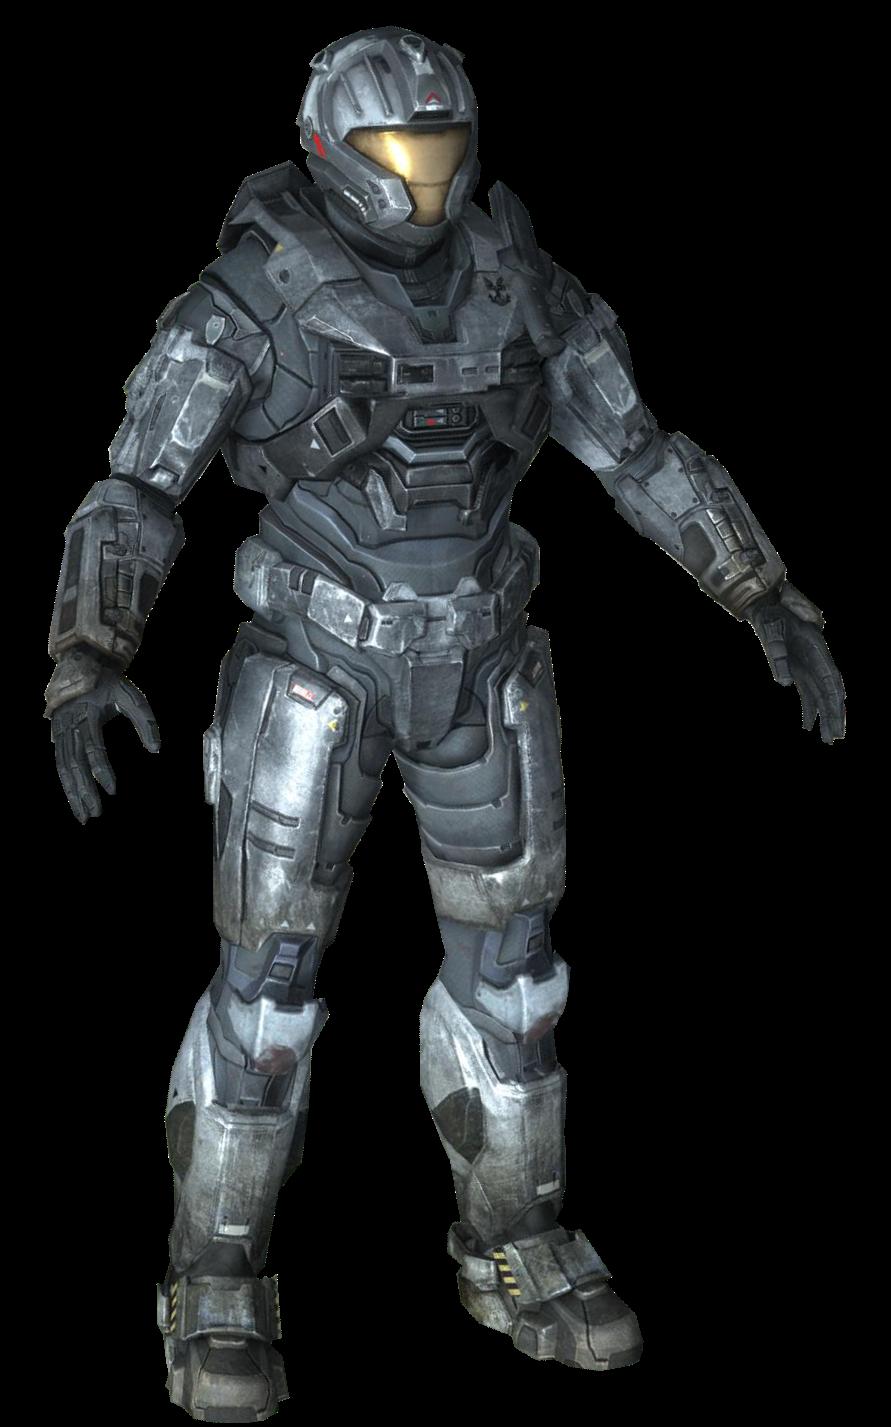 CQB-class Mjolnir - Halopedia, the Halo encyclopedia